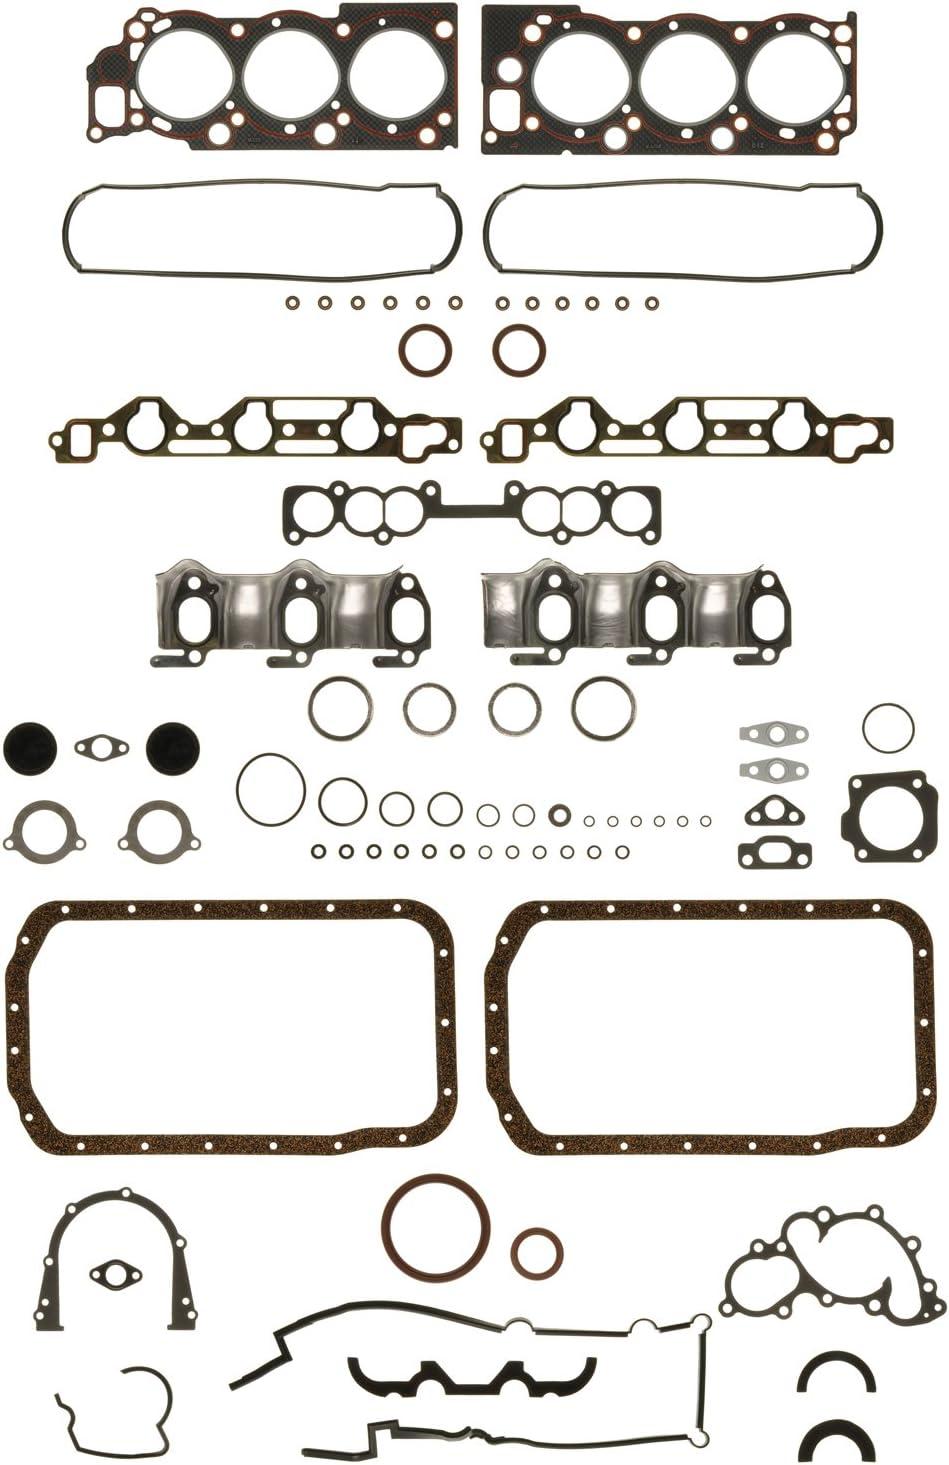 Ajusa 50147200 Full Gasket Set engine